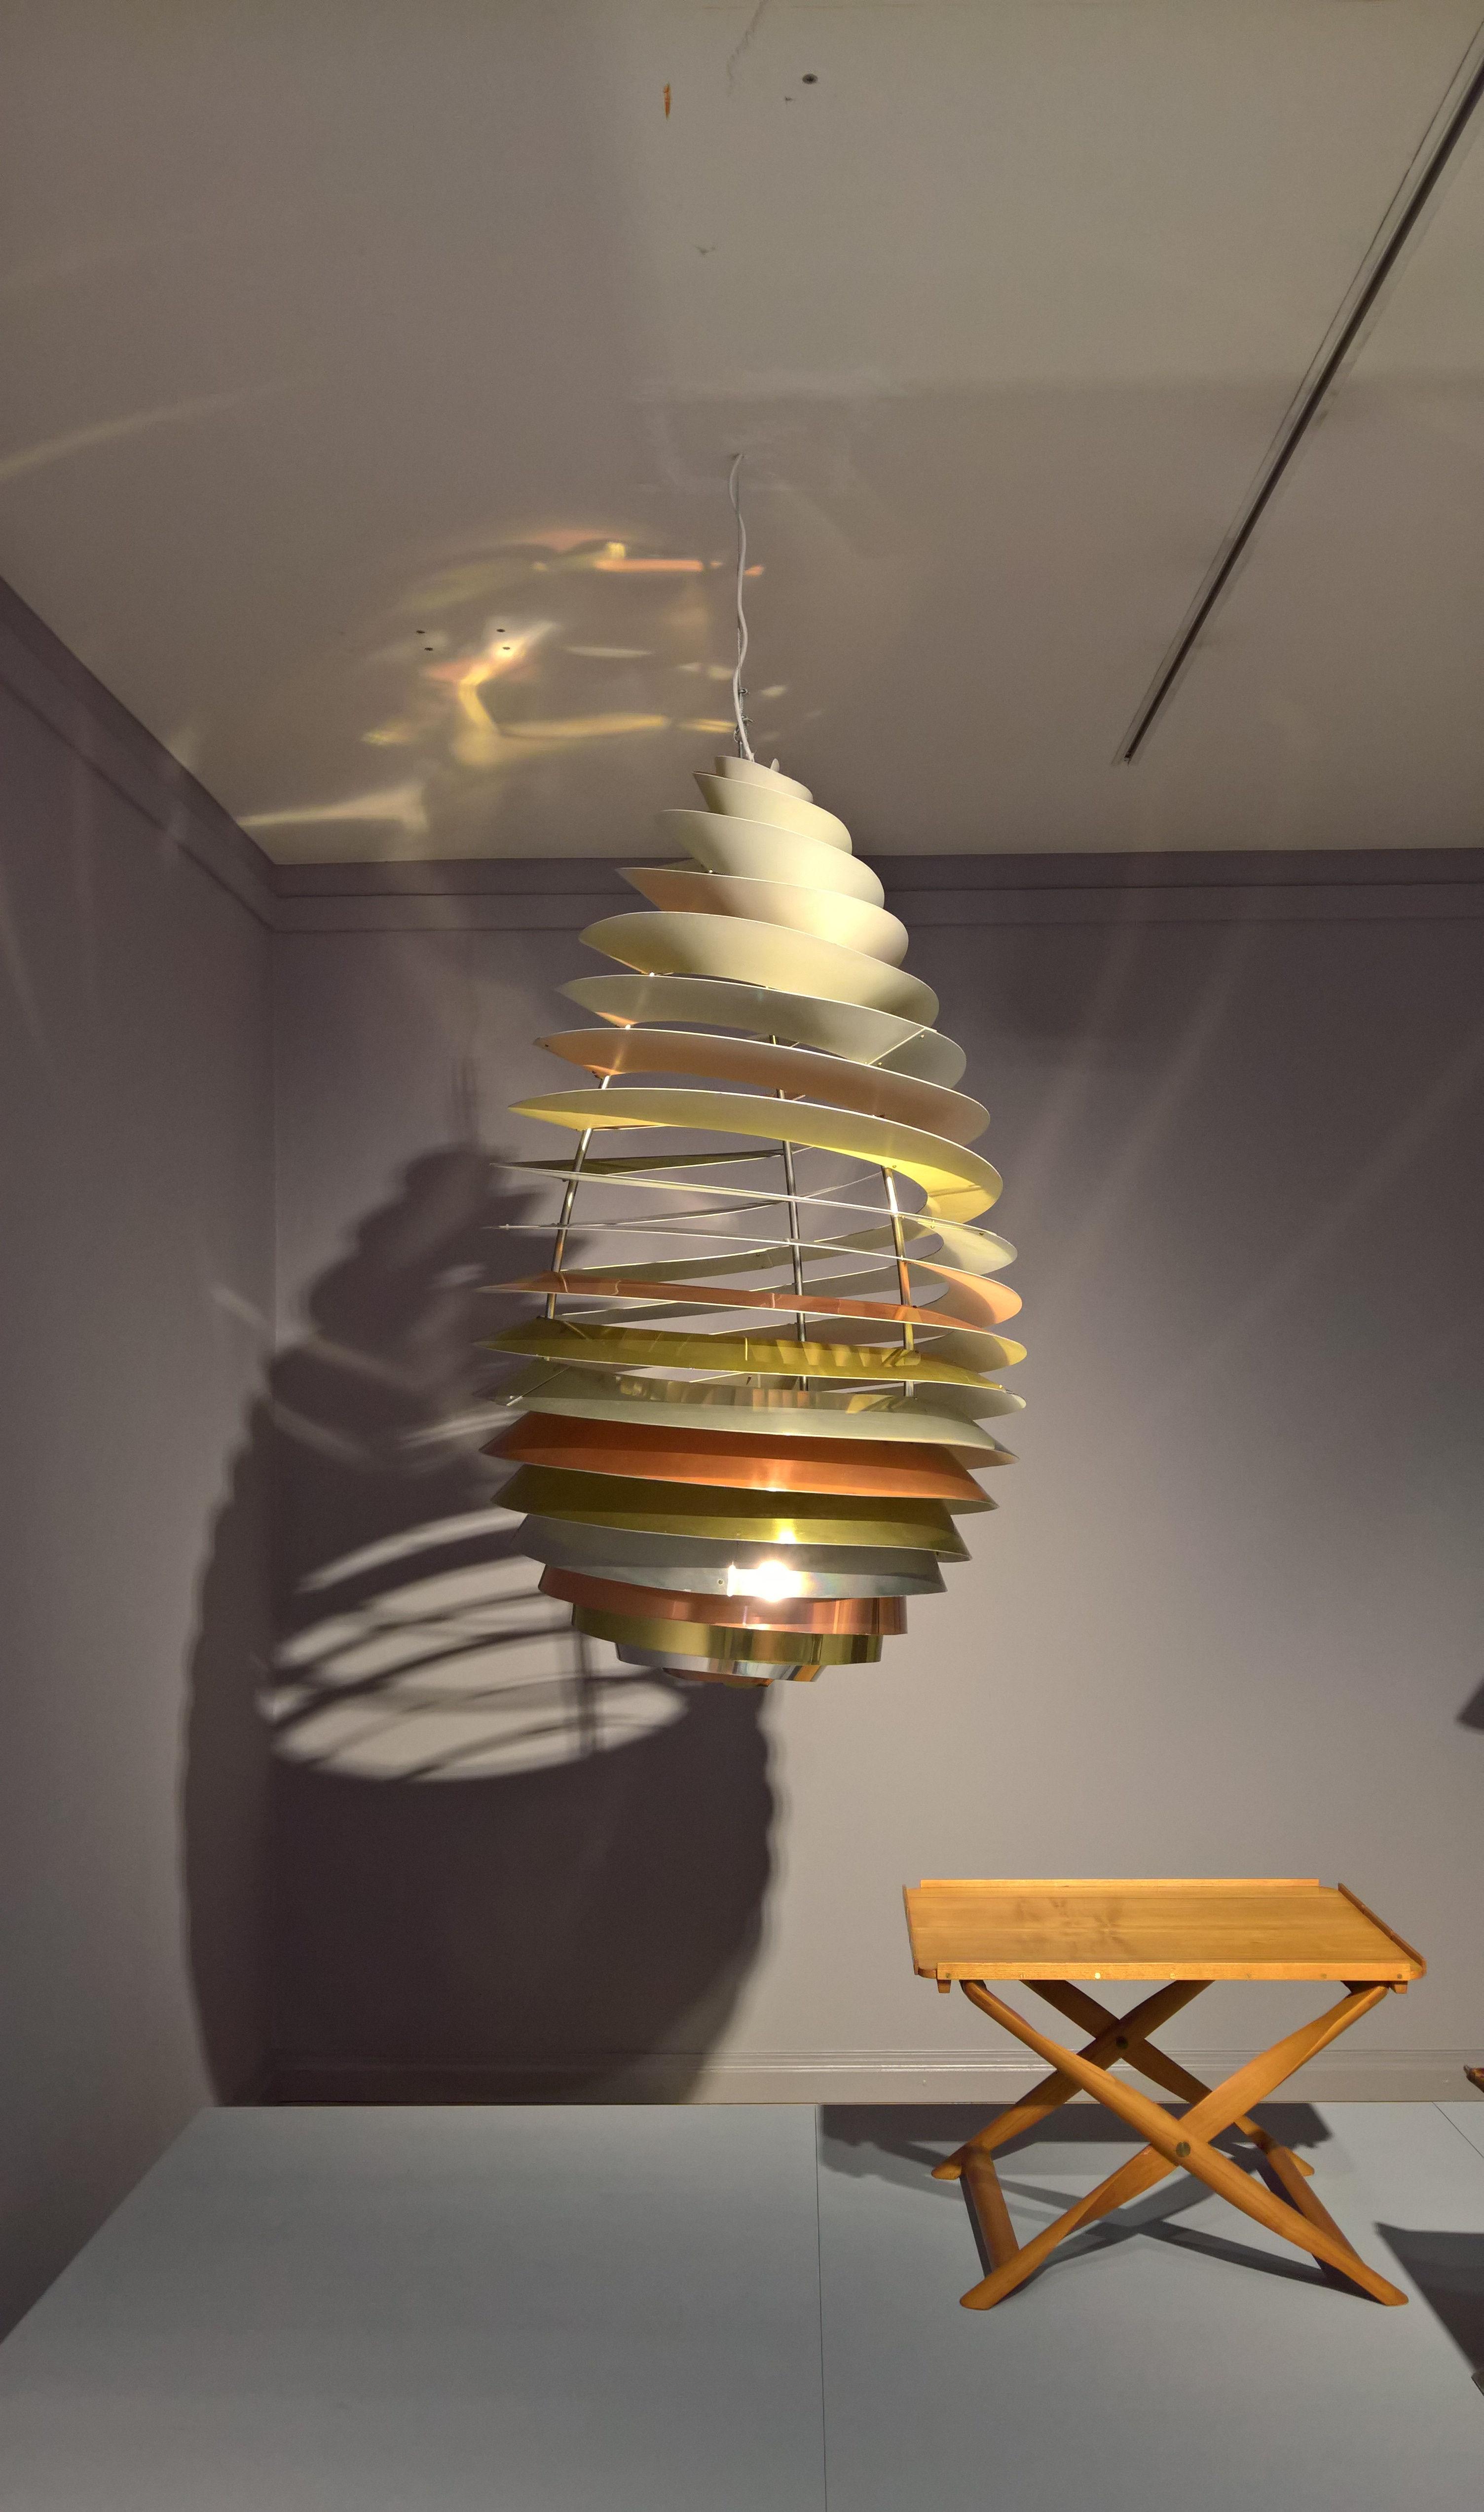 Spiral by Poul Henningsen for Louis Poulsen & Propeller stool by Kaare Klint, as seen at Nordic Design. The Response to the Bauhaus, Bröhan Museum, Berlin